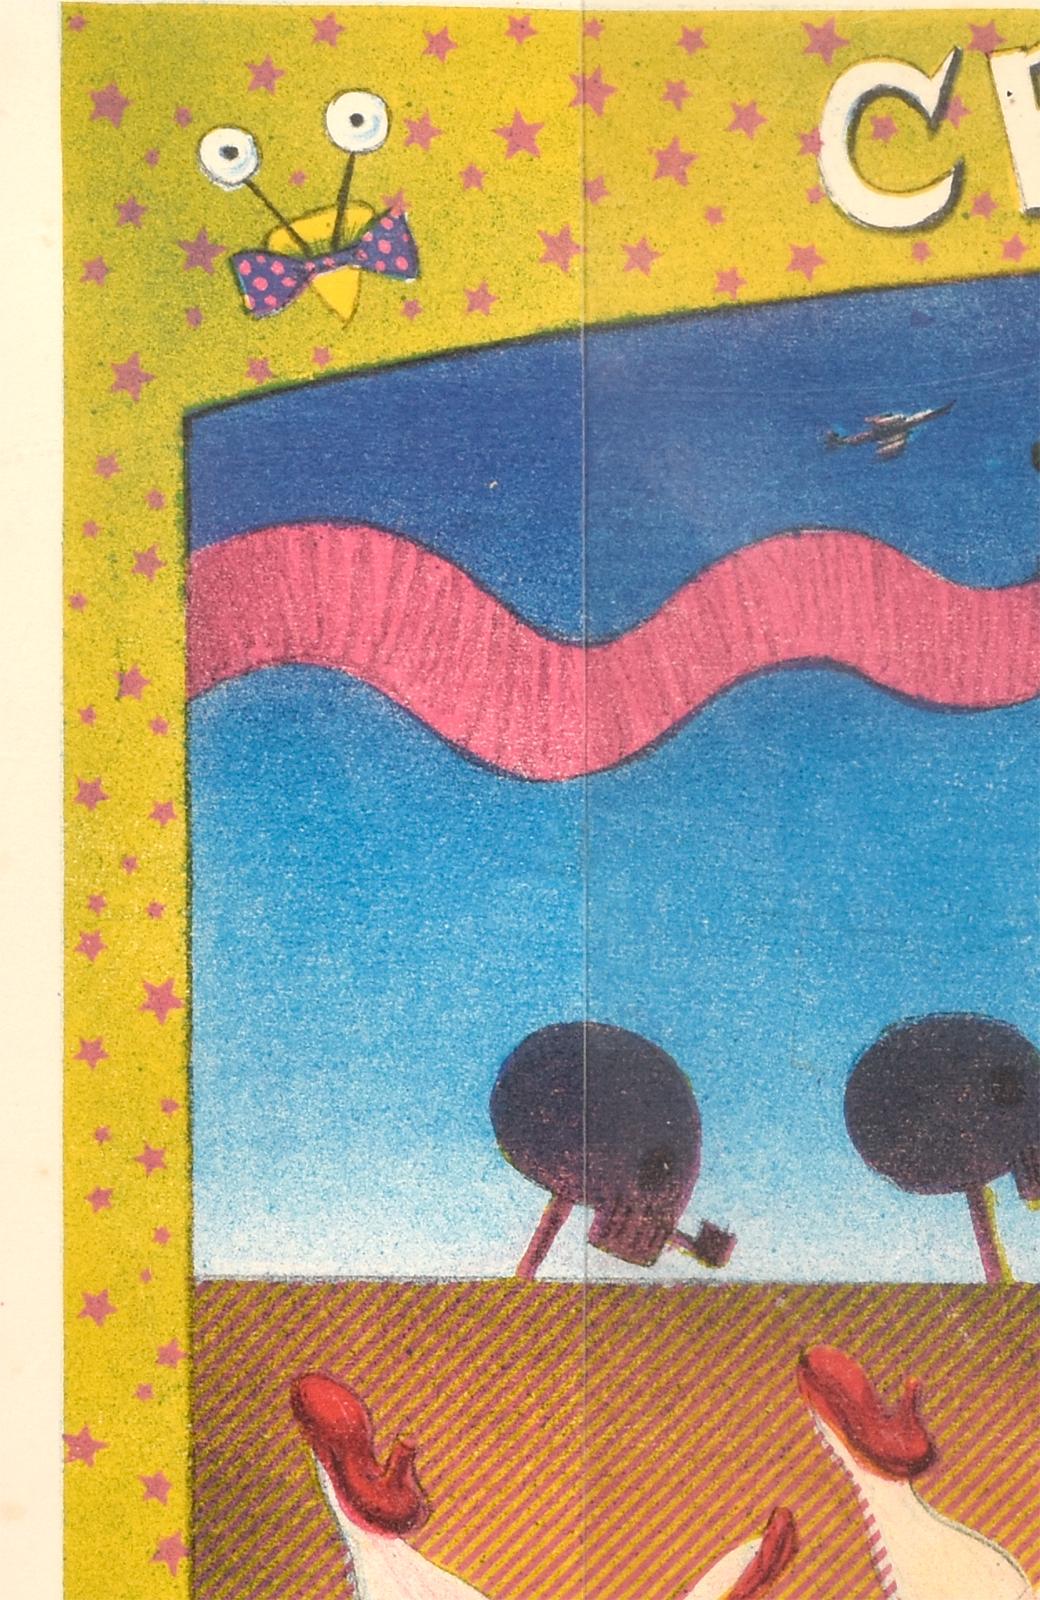 haco! 【アート】馬場檮男 「クレージーキット・3」 <その他>の商品写真2